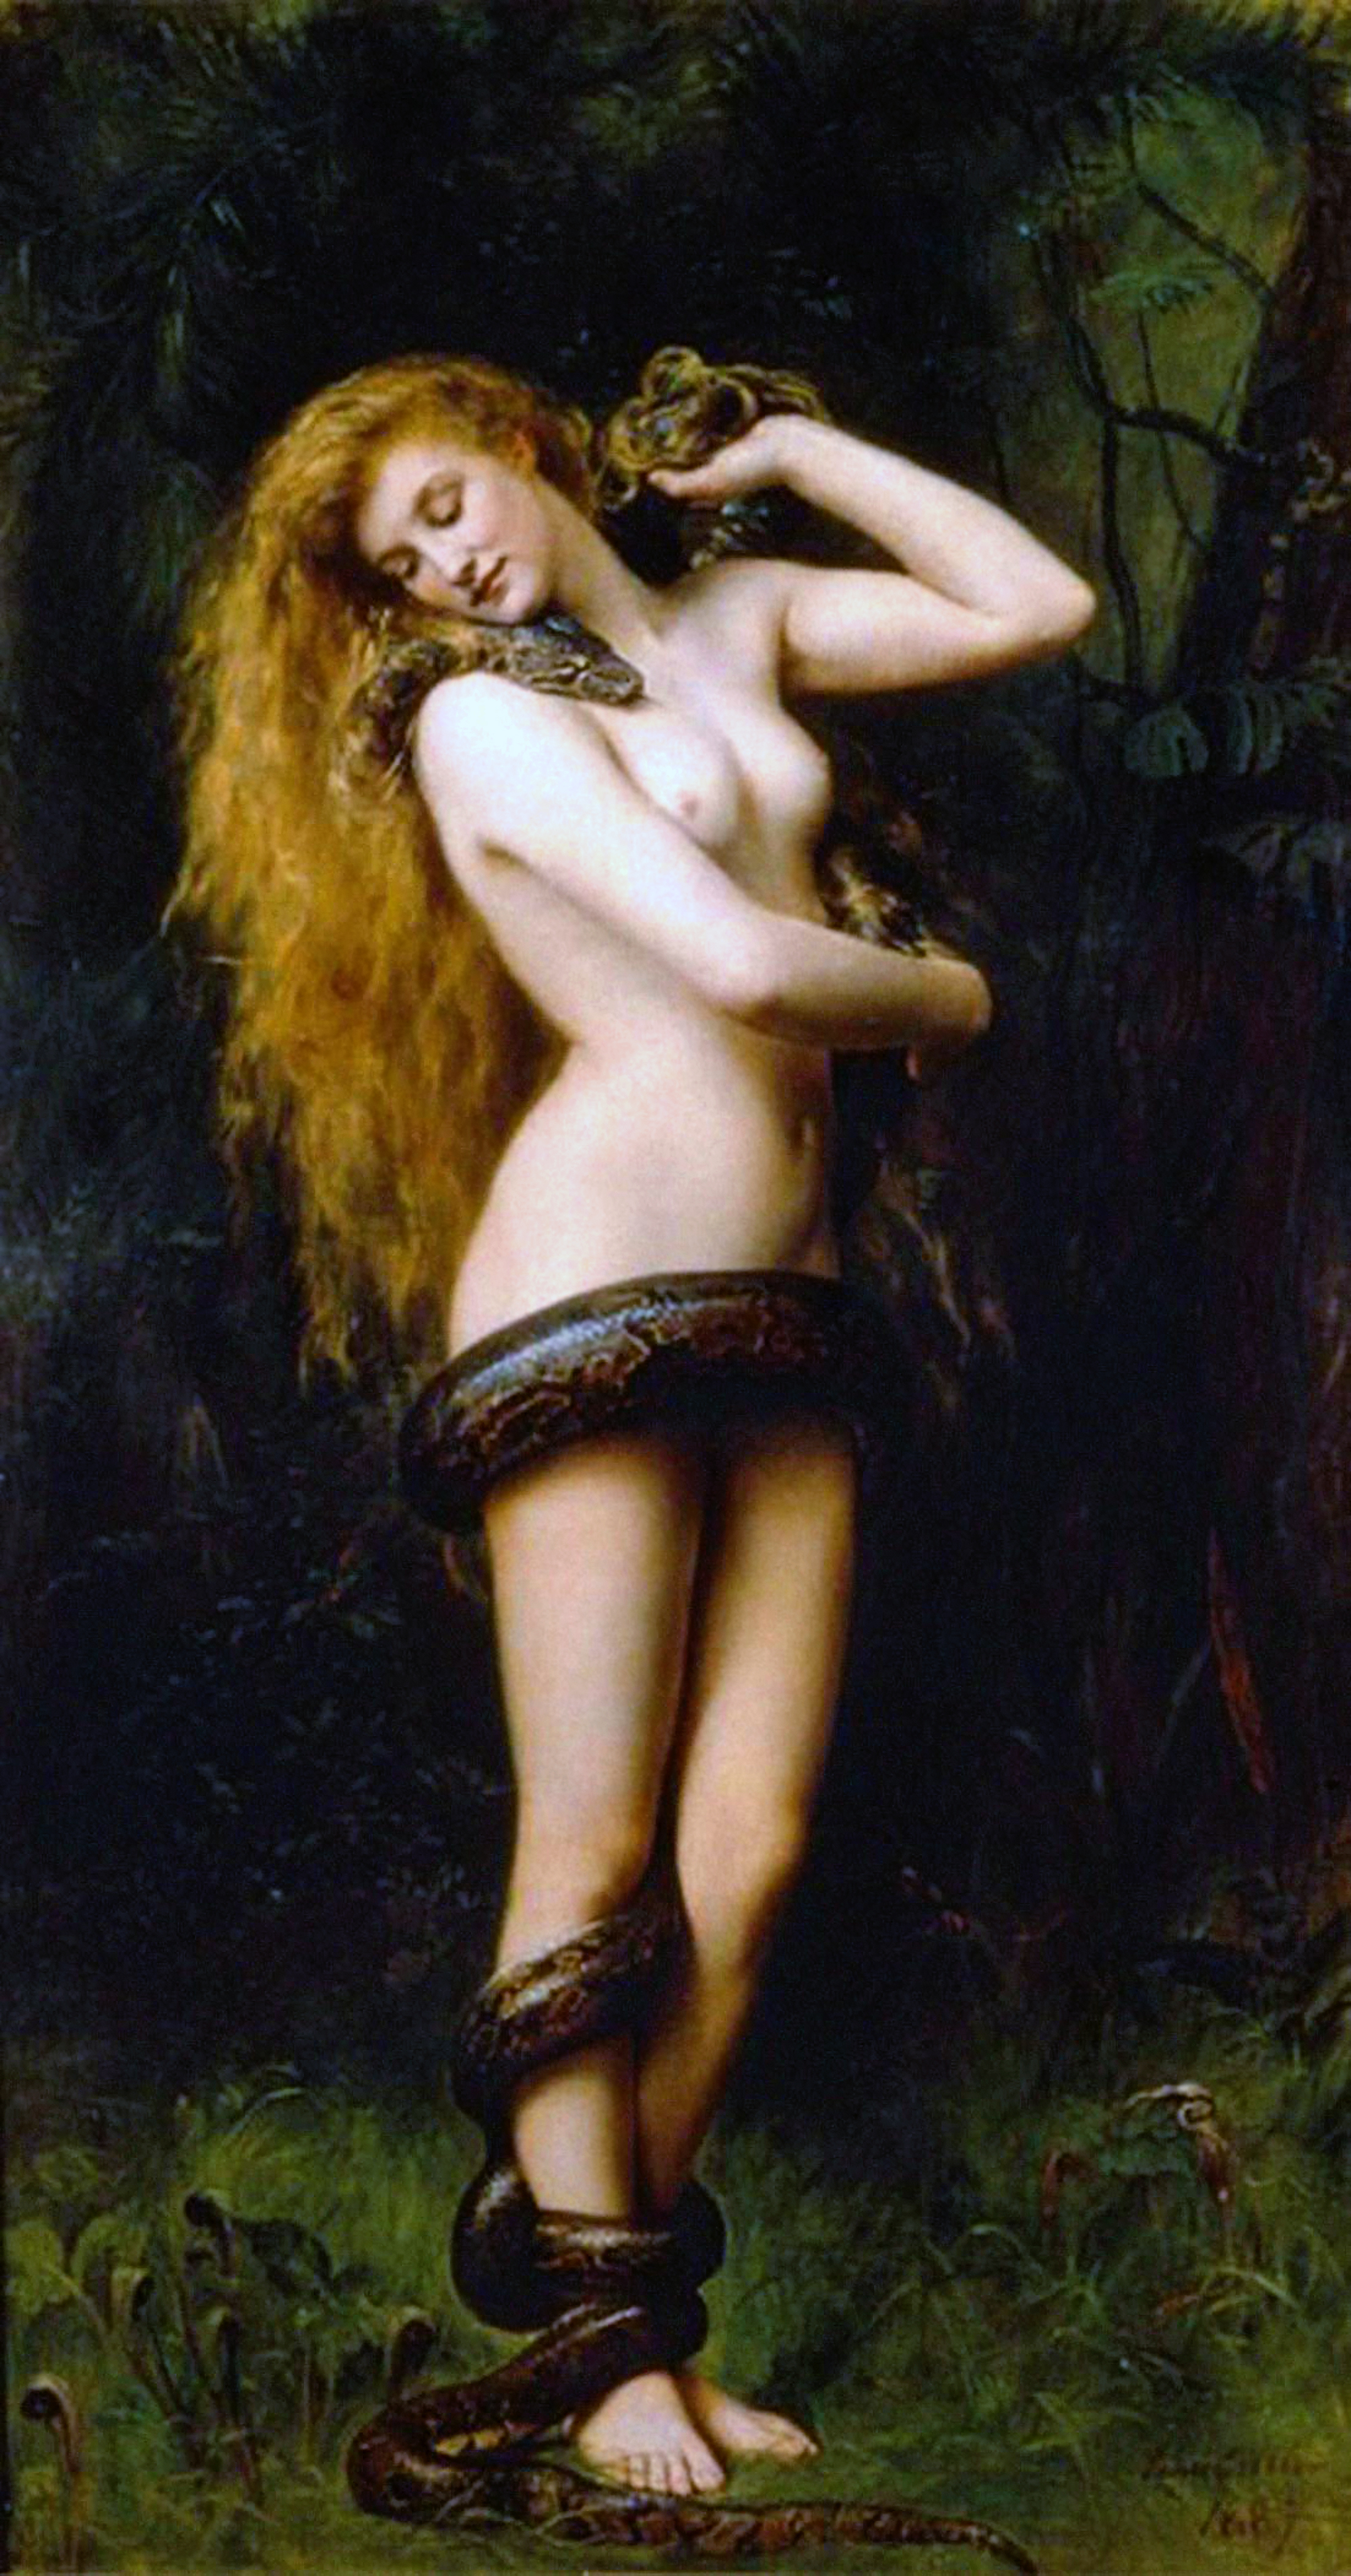 John Collier, Lilith, 1887